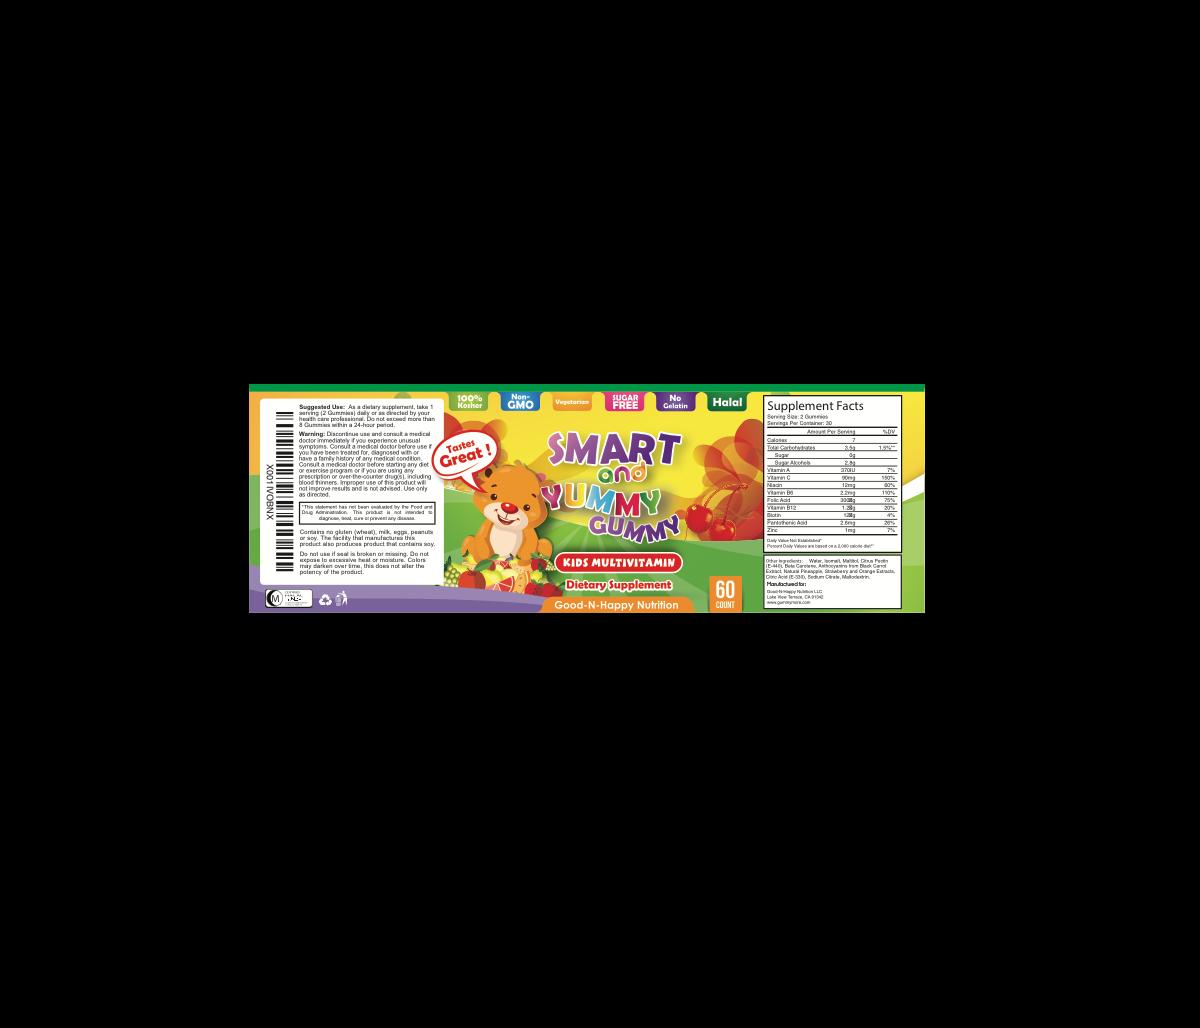 Smart and Yummy Gummy Label - Urgent